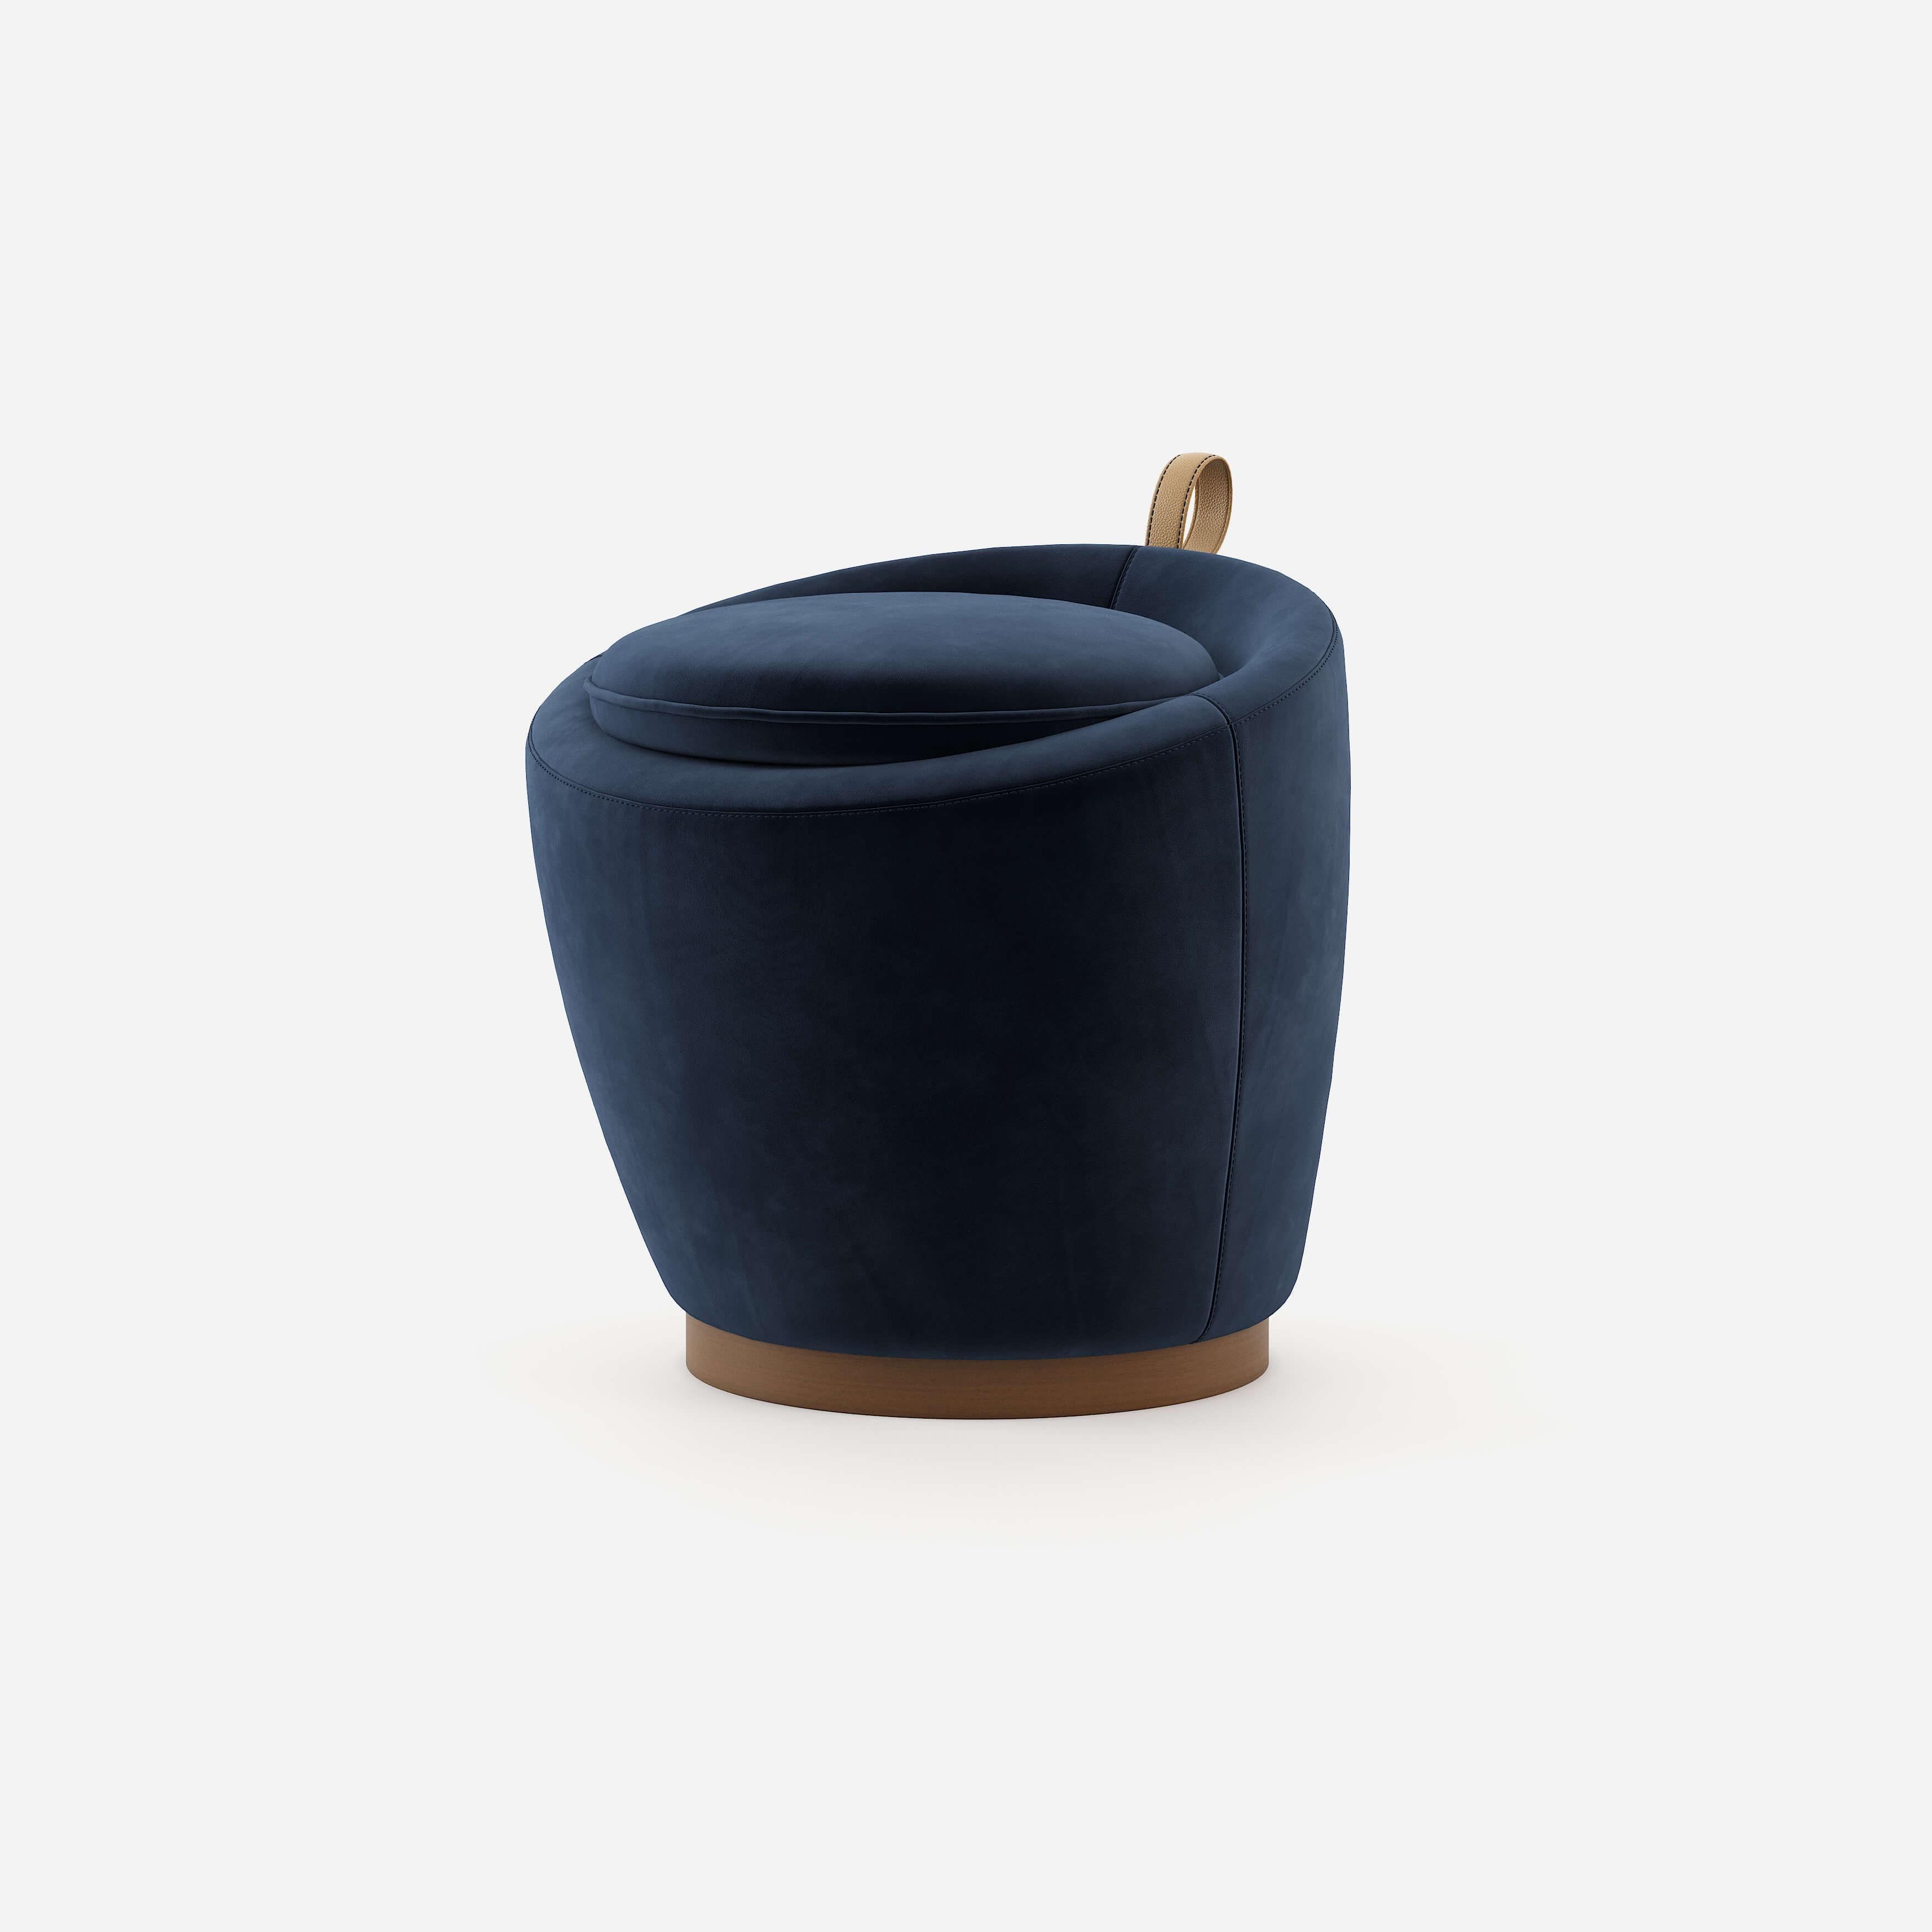 leia-puff-stool-wood-upholstered-furniture-velvet-handmade-wood-blue-domkapa-1